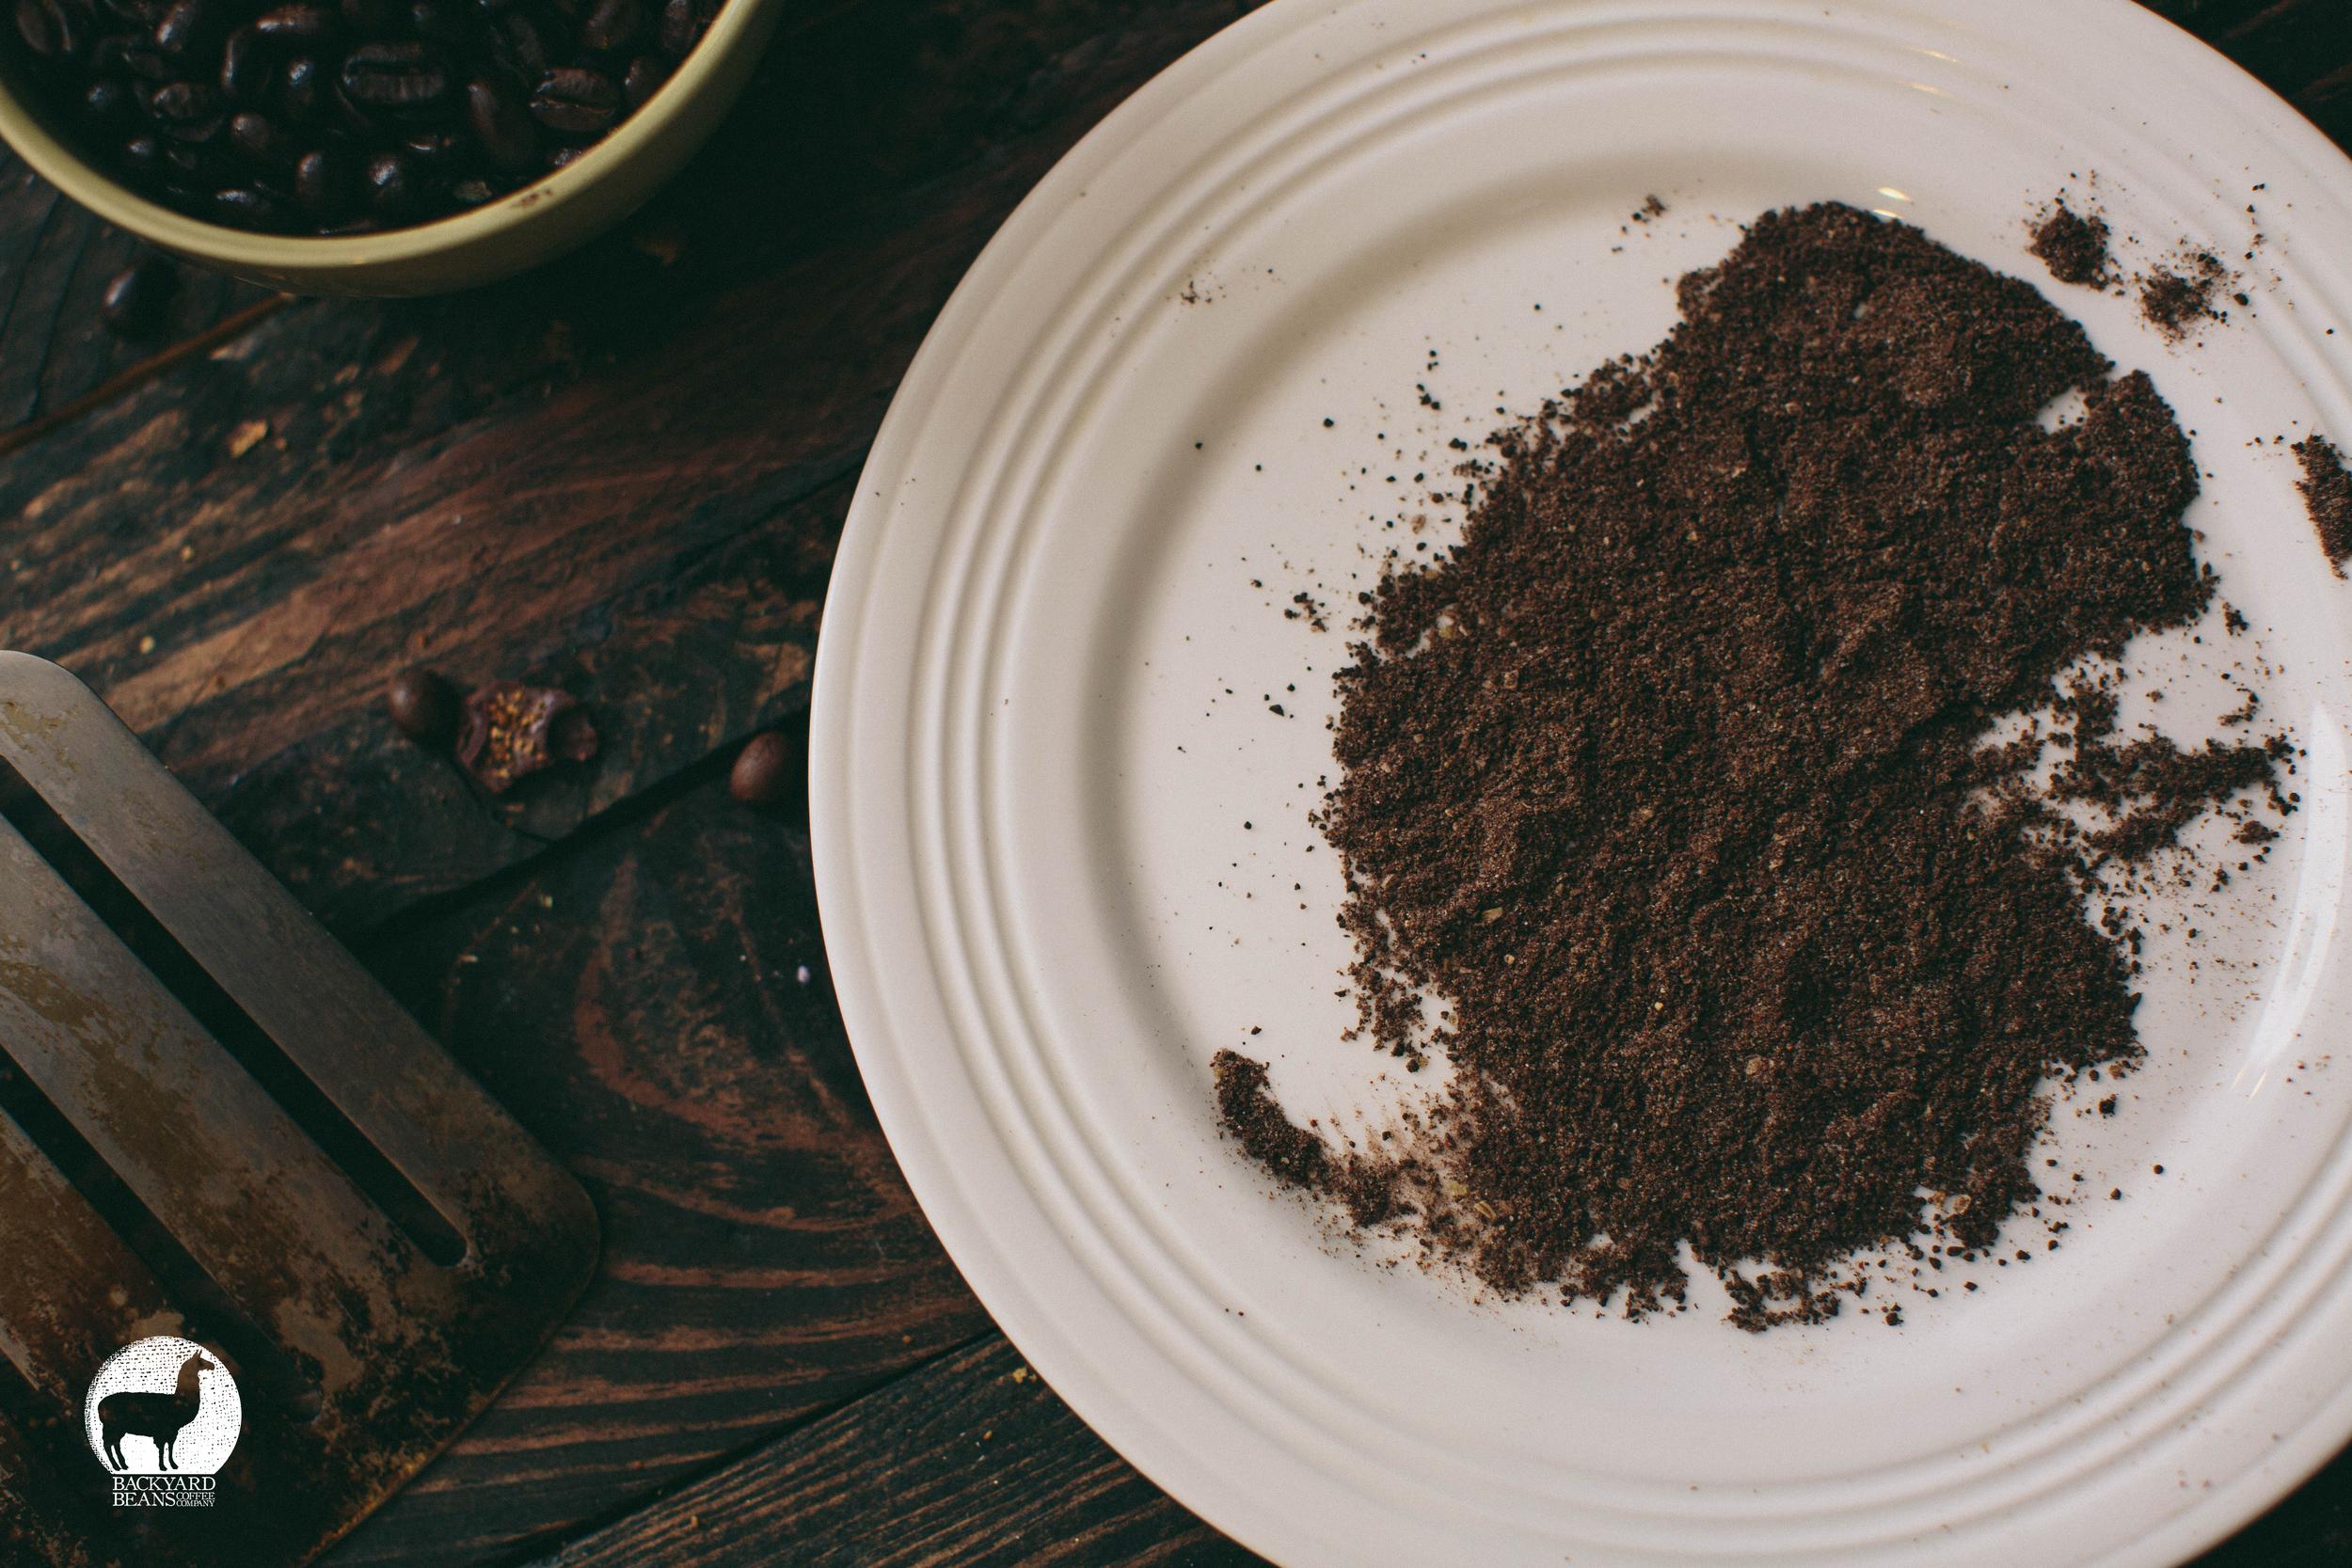 BACKYARD BEANS, COFFEE GRILL RUB.